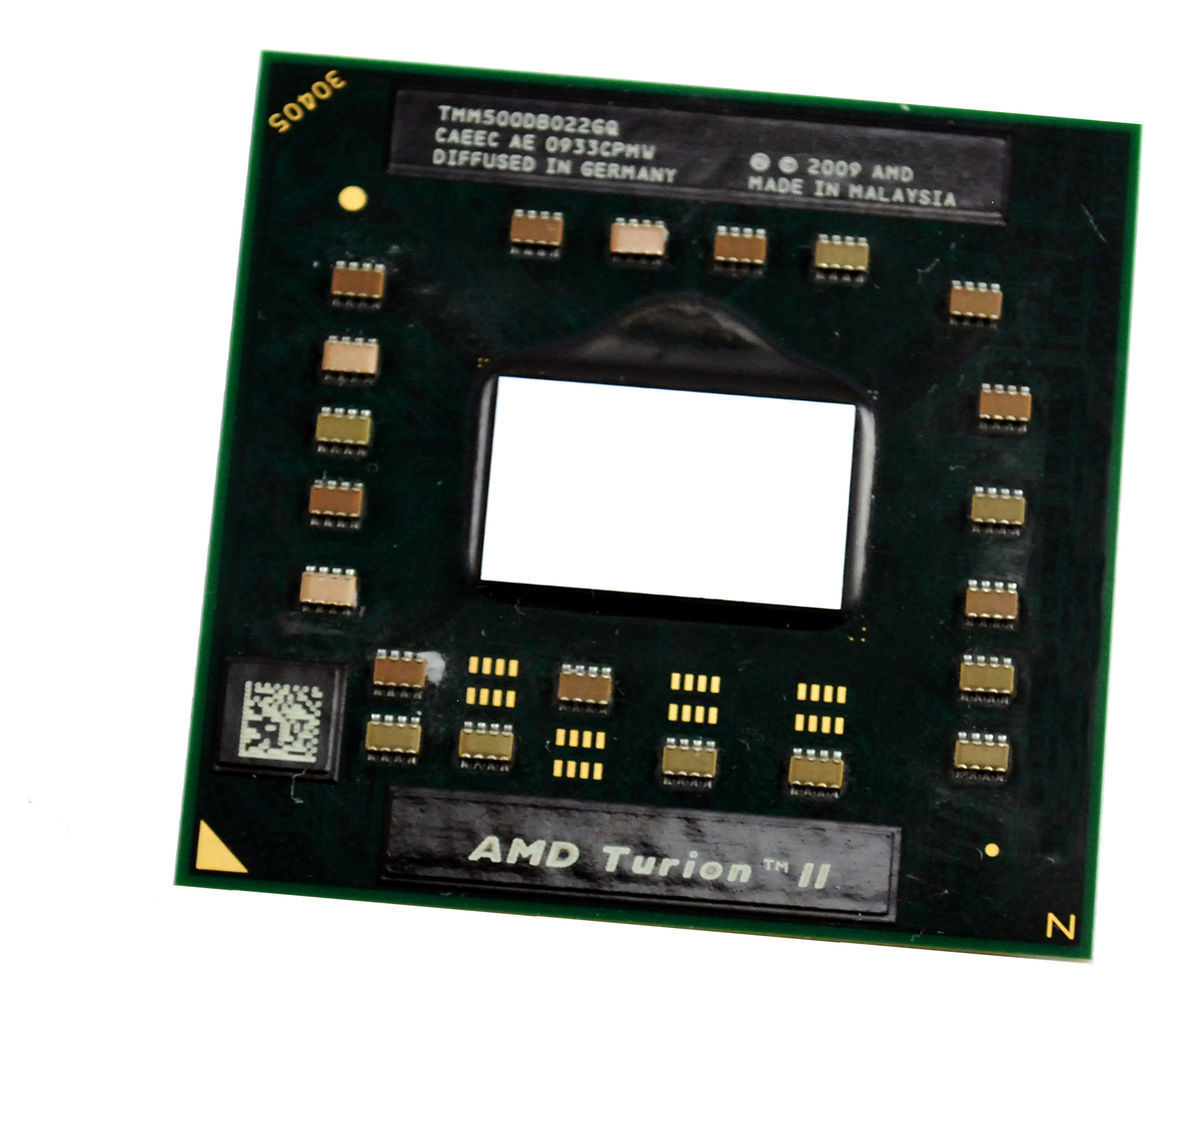 Processador Notebook AMD Turion II 2.2ghz TMM500DB022GQ (semi novo)